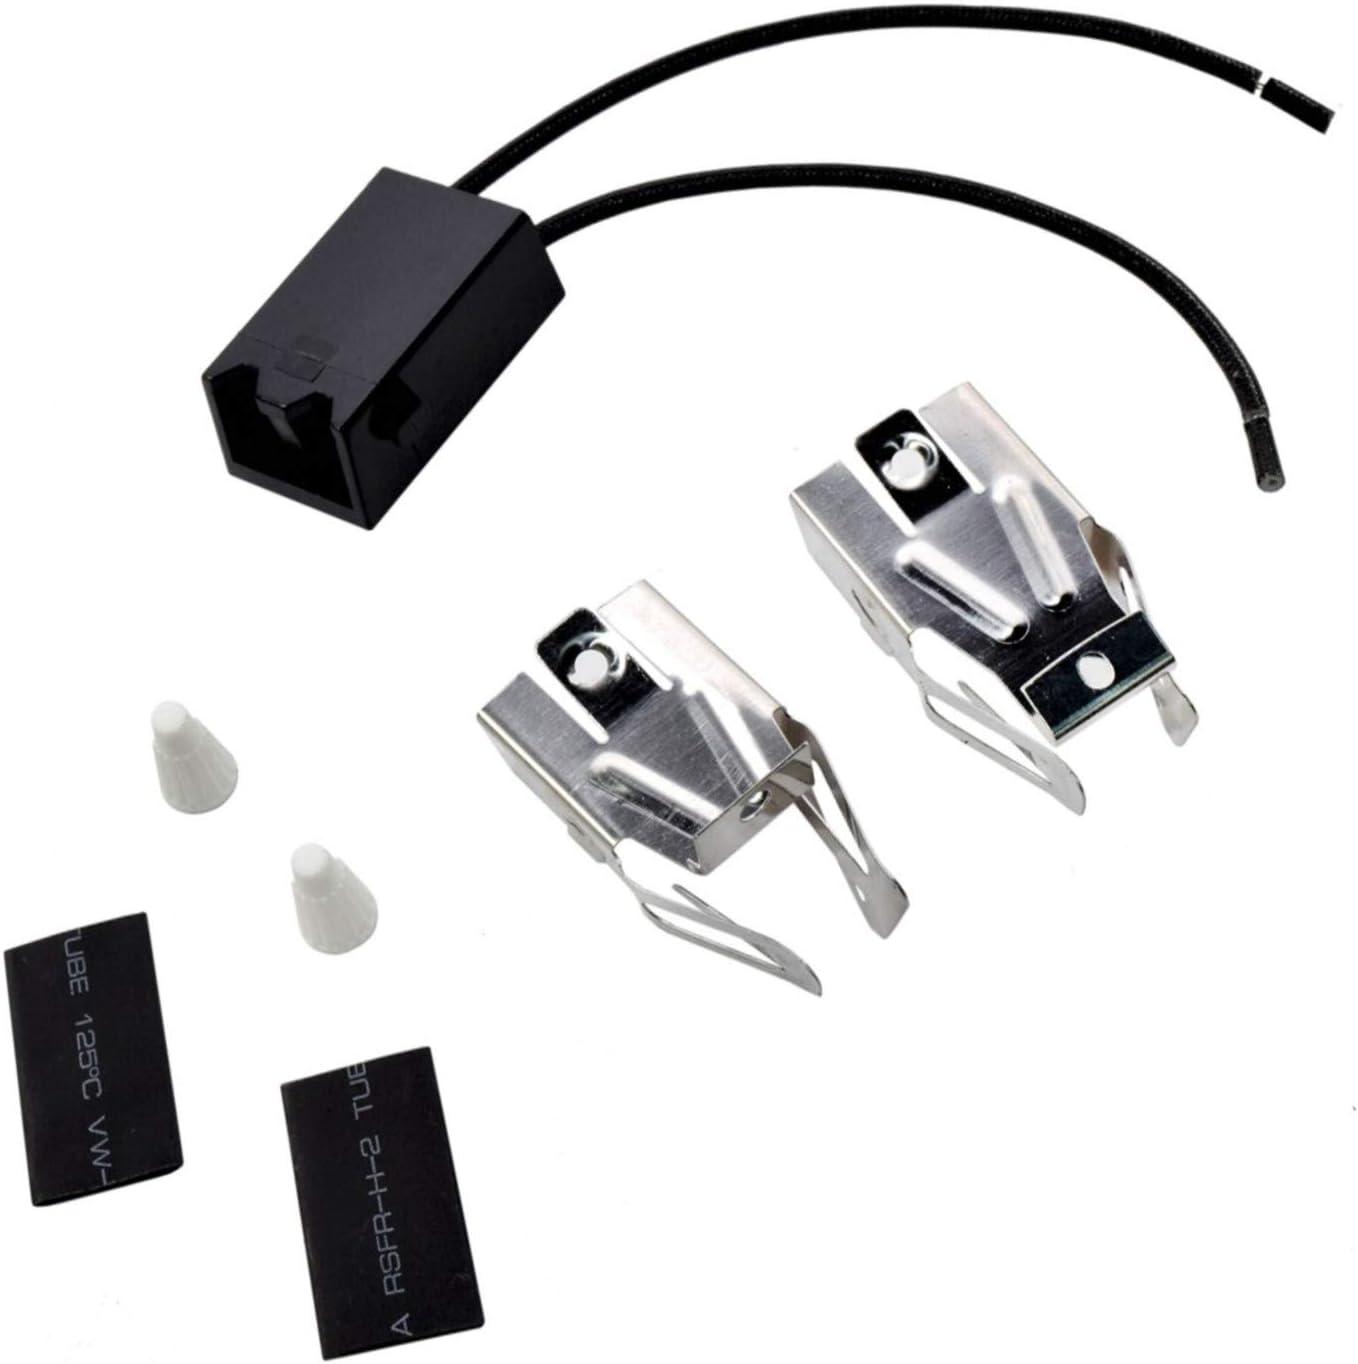 HQRP Range Top Burner Receptacle Kit Replacement for Whirlpool 13460A 1346W0A 13470A 13551A 13552A 13553A 1355W1A 1355W3A 13950A 13952A 1395W0A 1395W2A Oven Stove plus HQRP Coaster